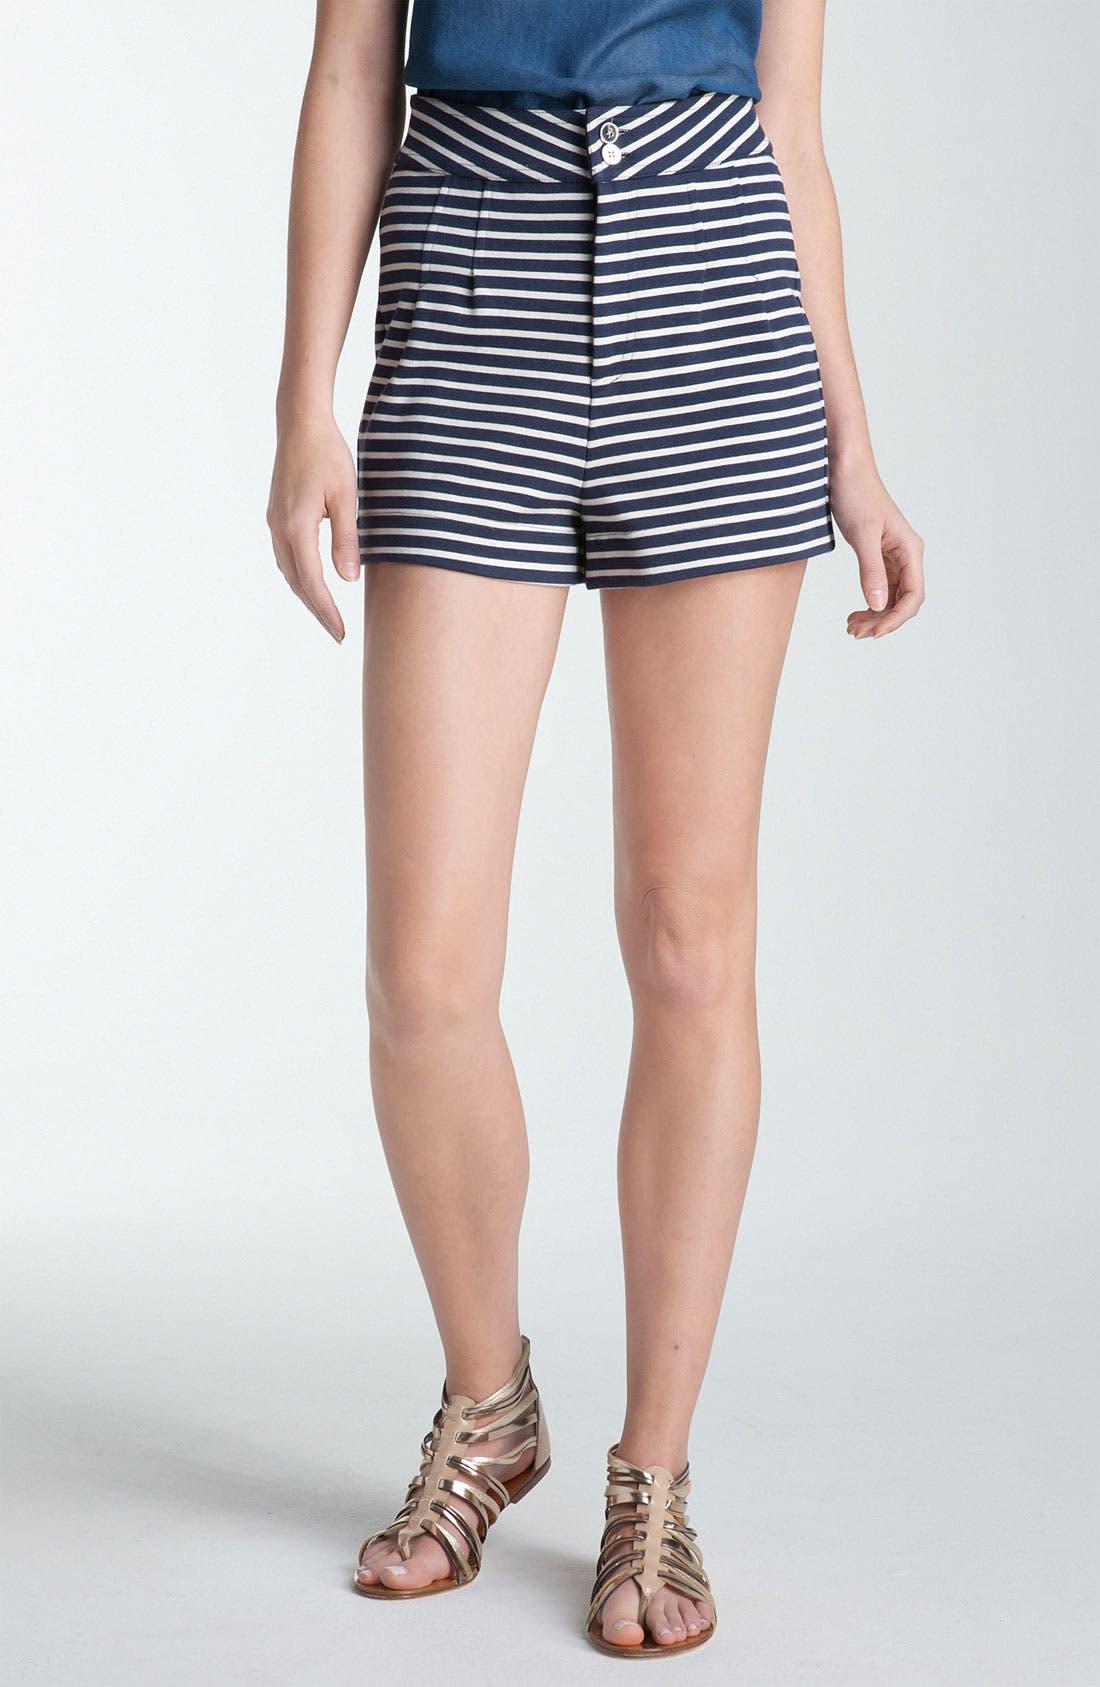 Alternate Image 1 Selected - MARC BY MARC JACOBS 'Secret' Stripe Shorts